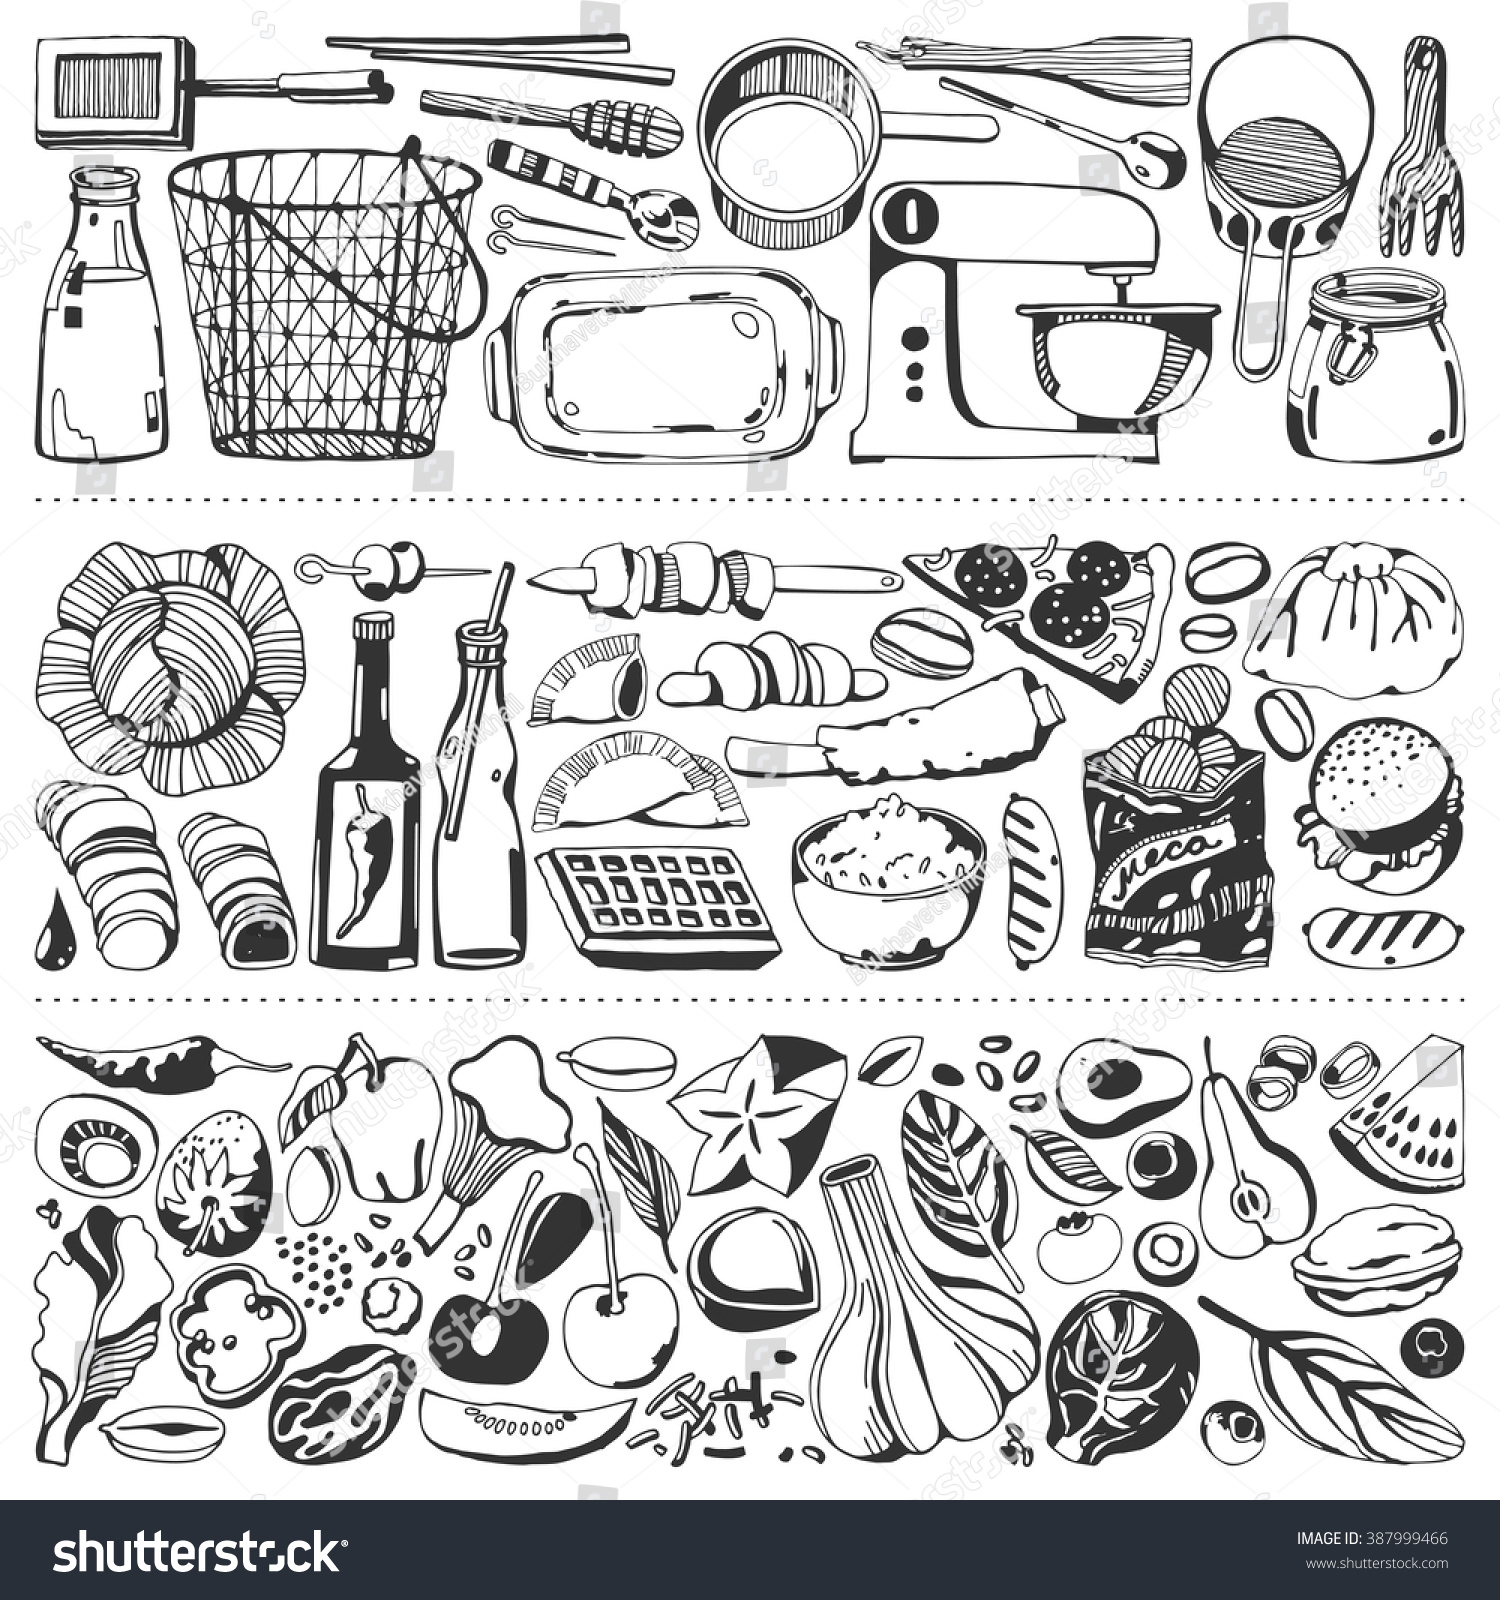 Kitchen tools drawing - Food Flyer Set Kitchen Tools Vegetables Food